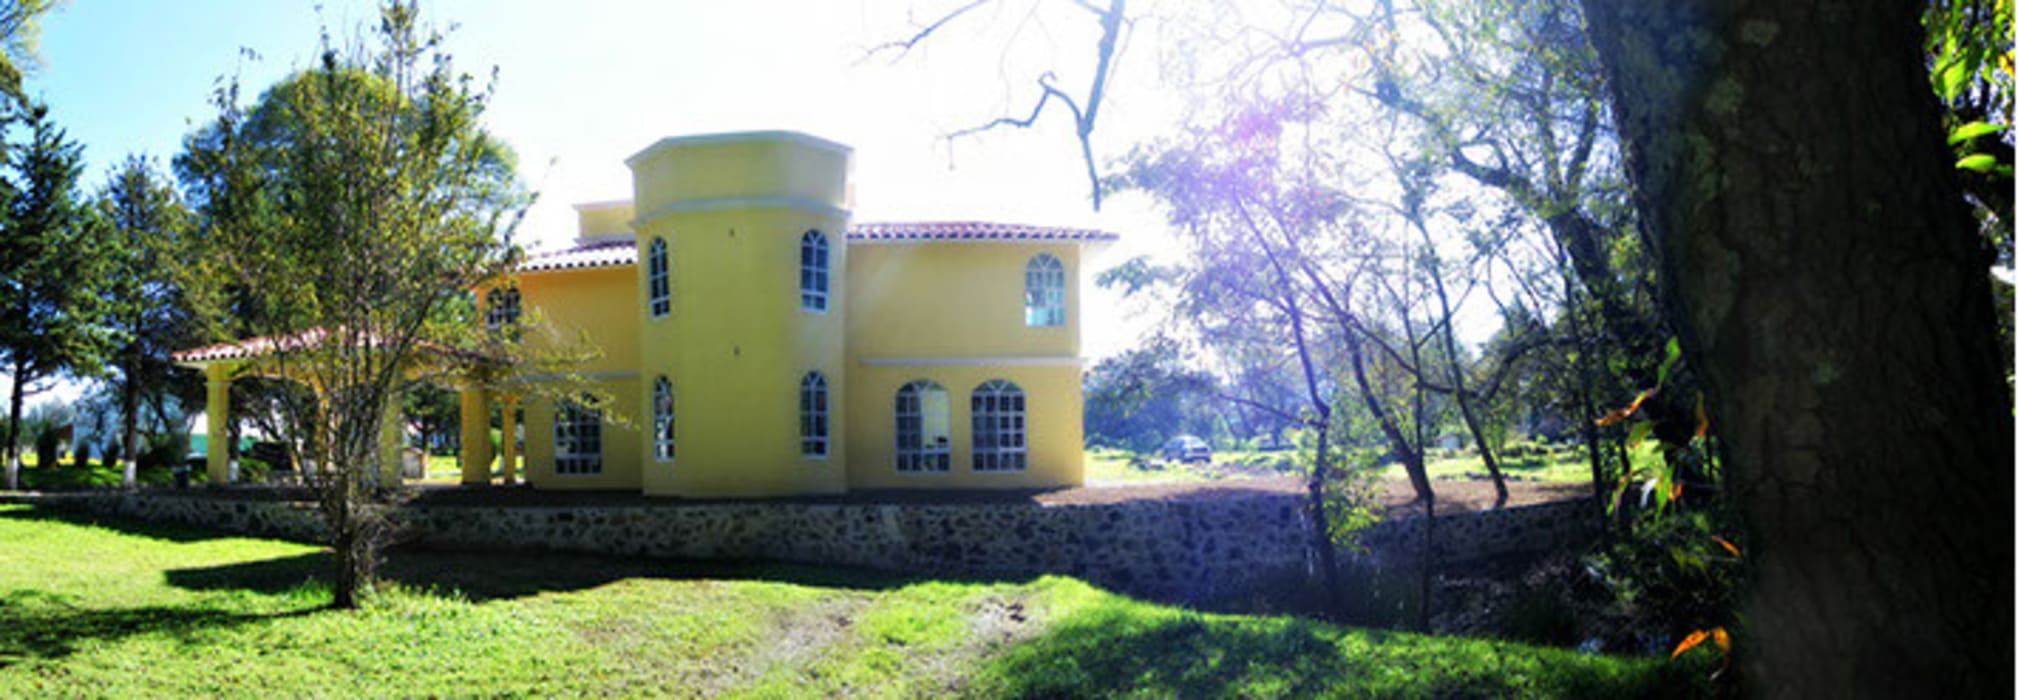 Constructora La Iliada บ้านและที่อยู่อาศัย